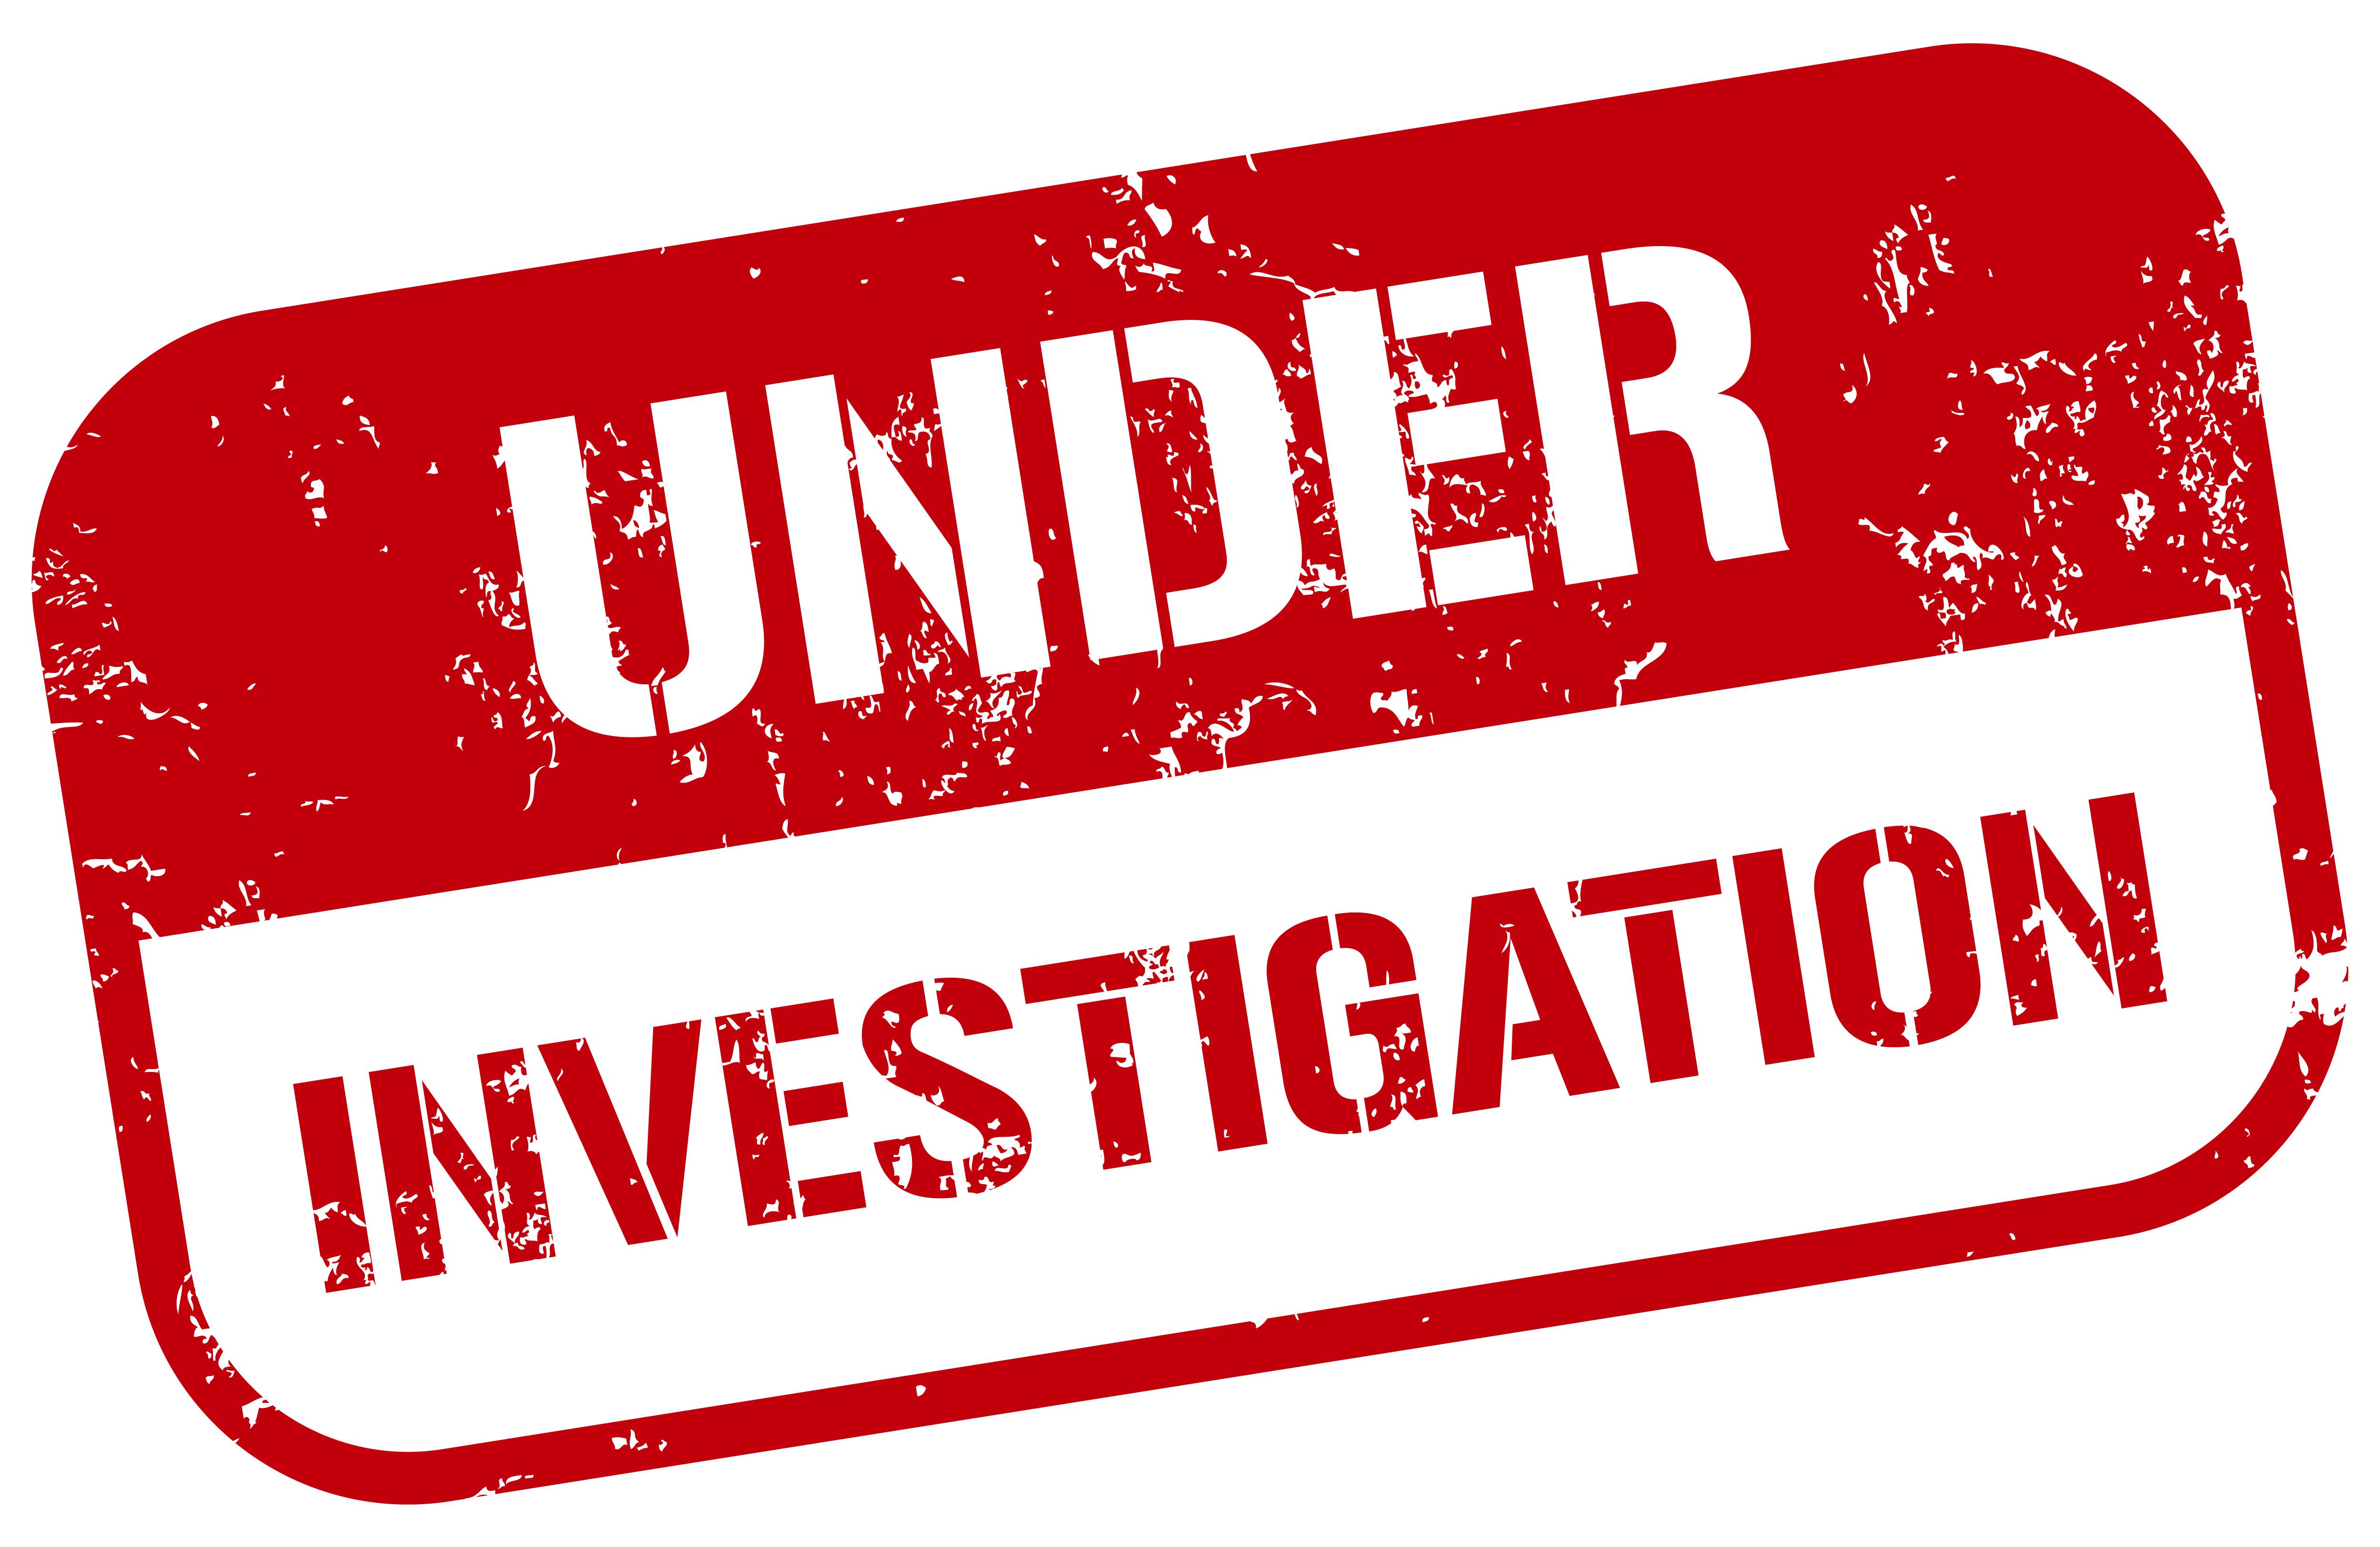 Wexford General Hospital Bowel Screening Investigation